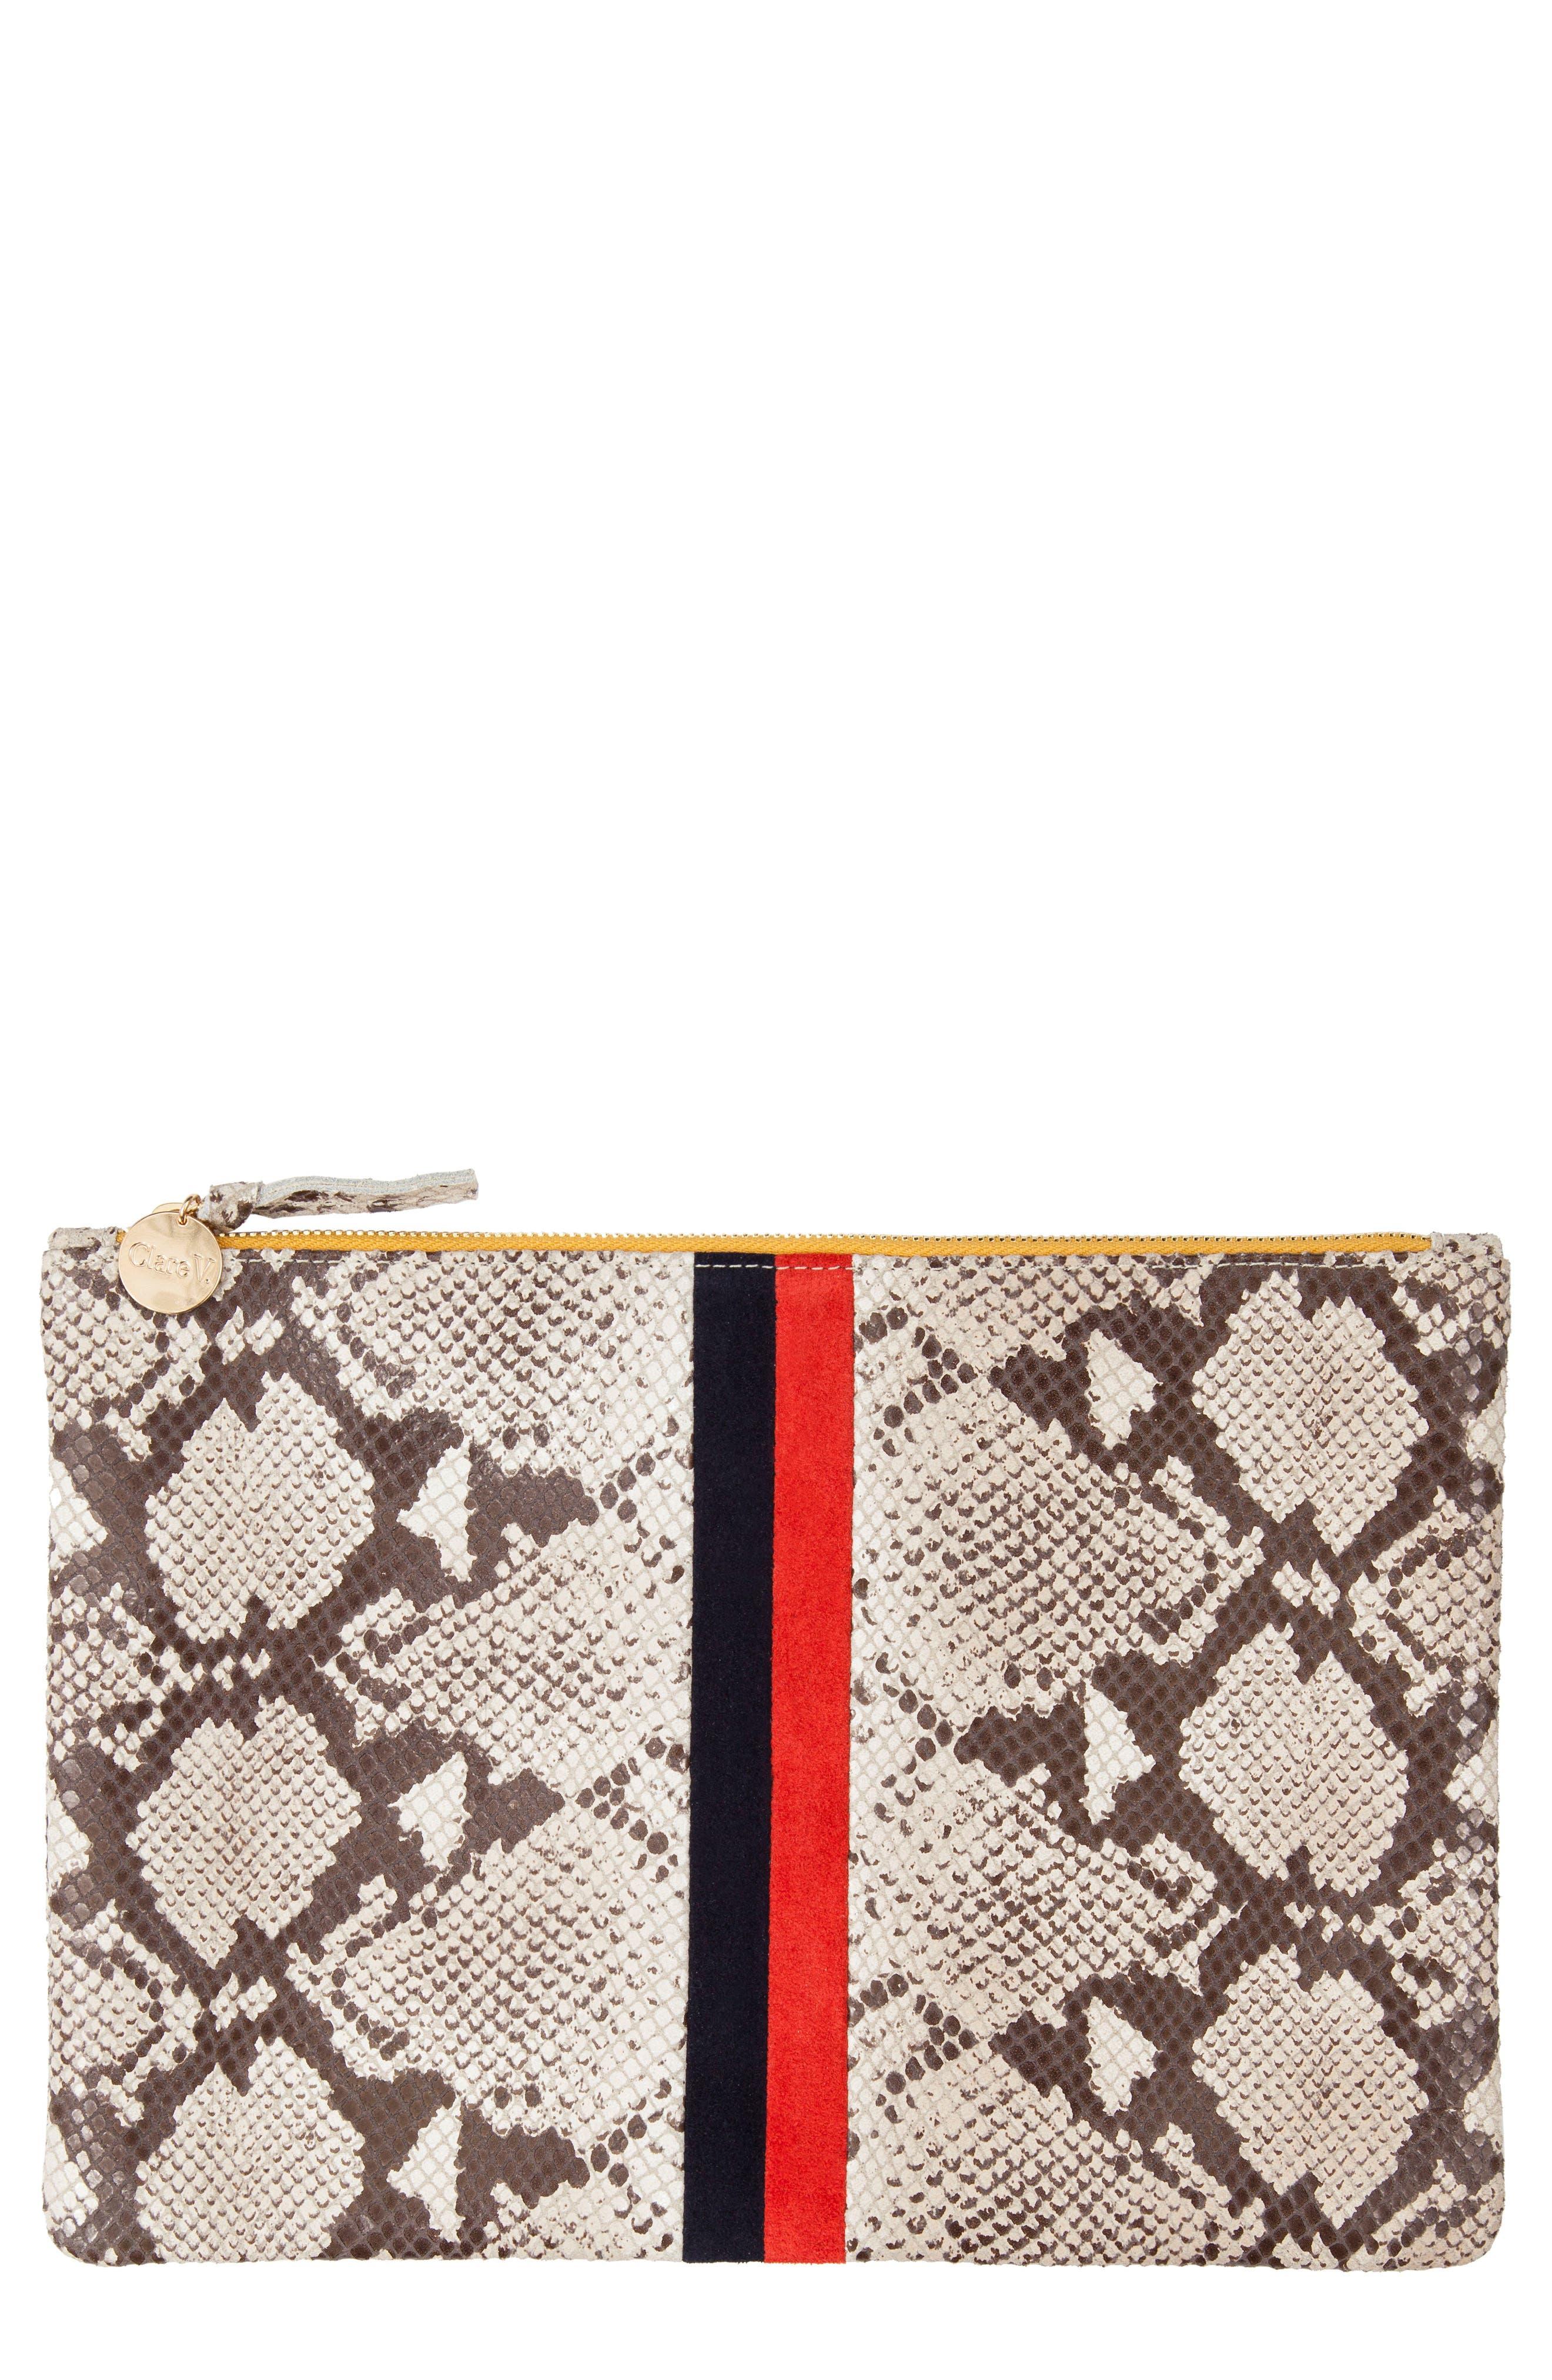 Clare V. Center Stripe Snakeskin Embossed Leather Clutch